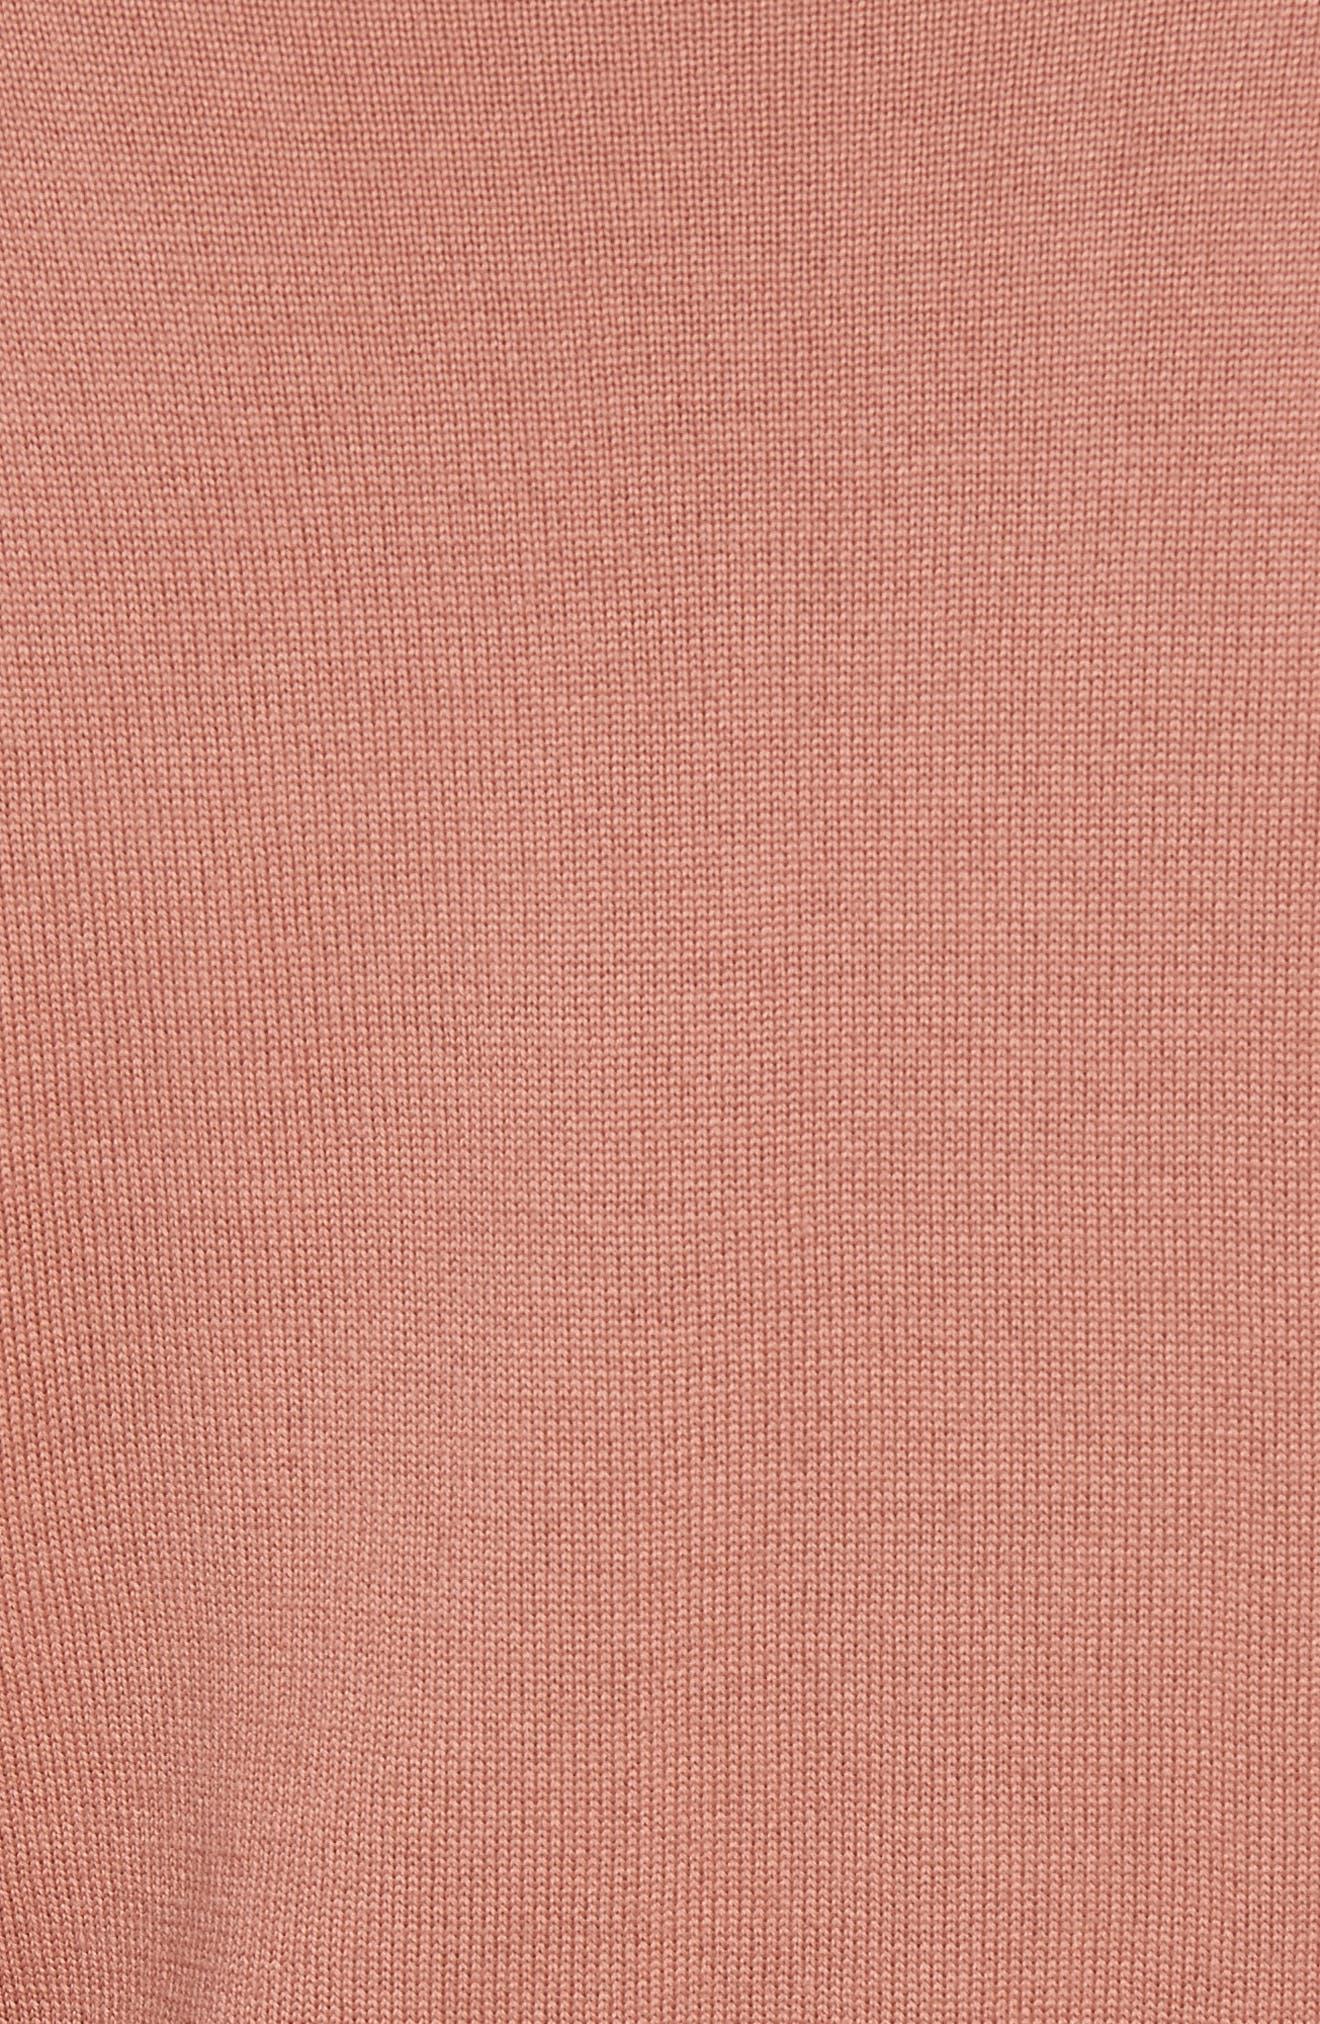 Tie Front Turtleneck Sweater,                             Alternate thumbnail 5, color,                             682